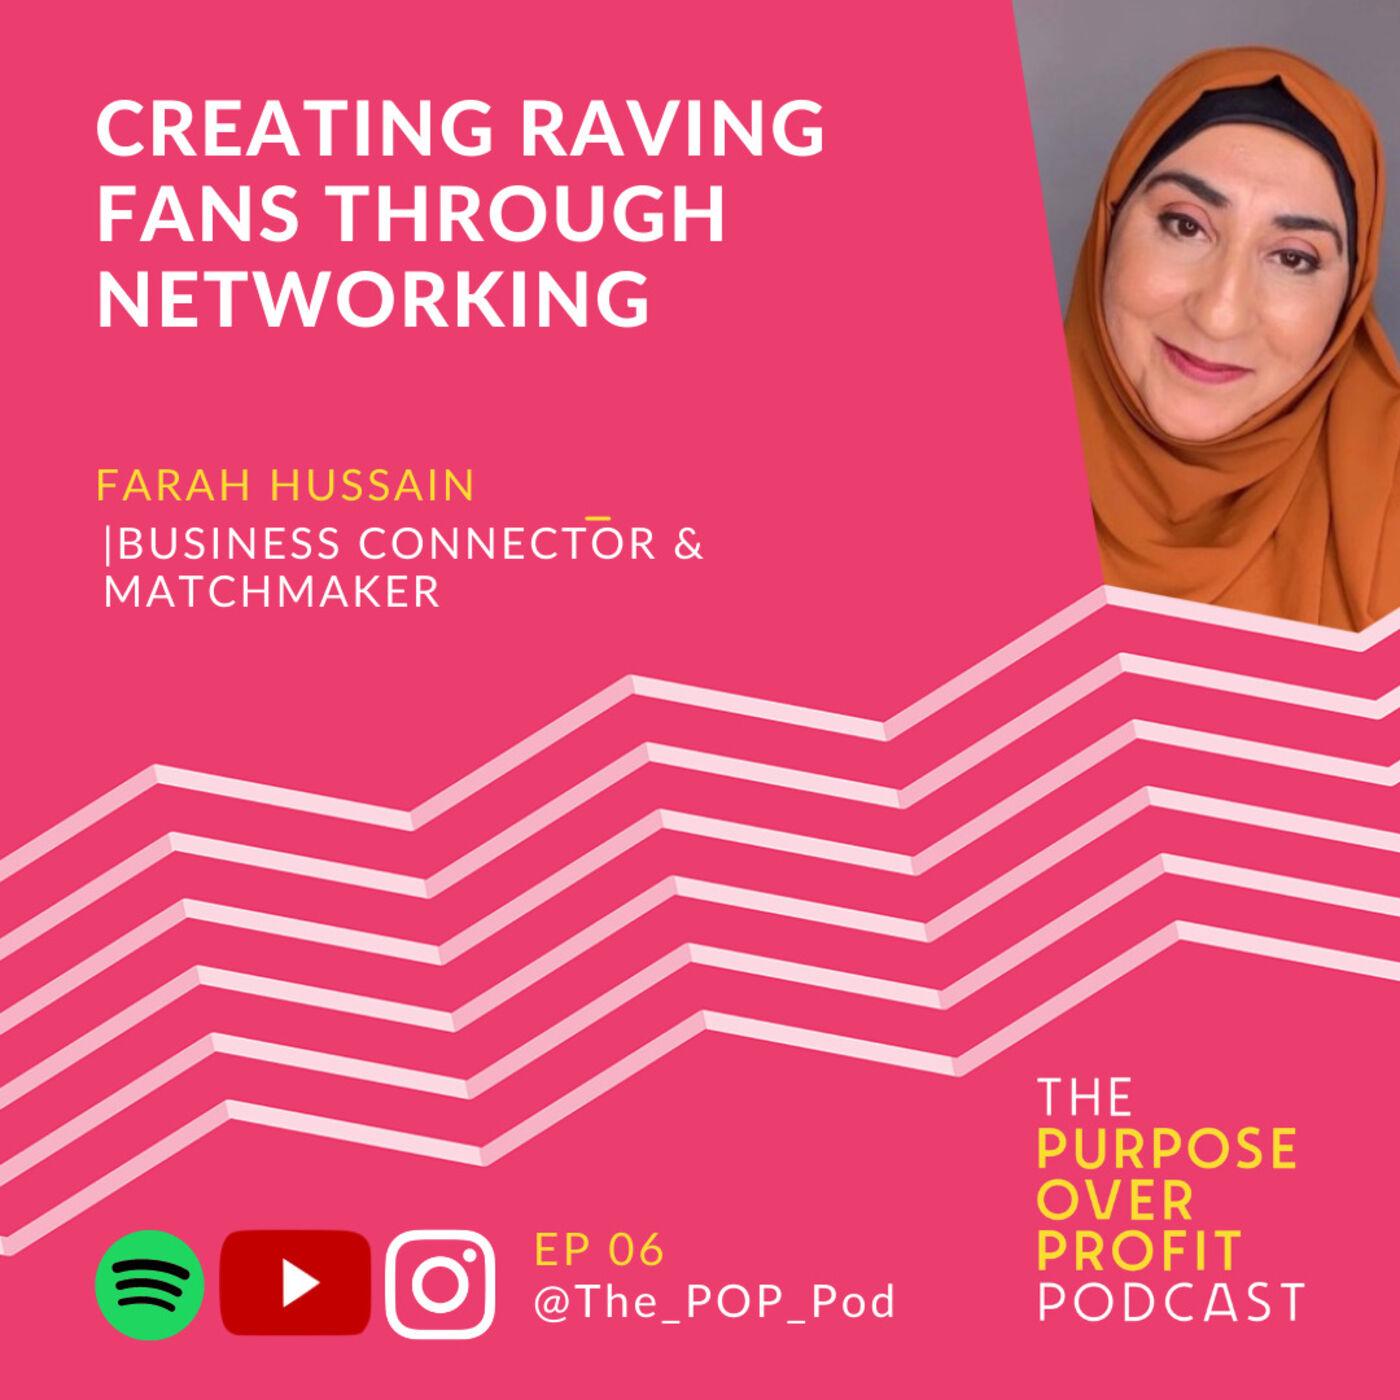 6 - Creating Raving Fans Through Networking